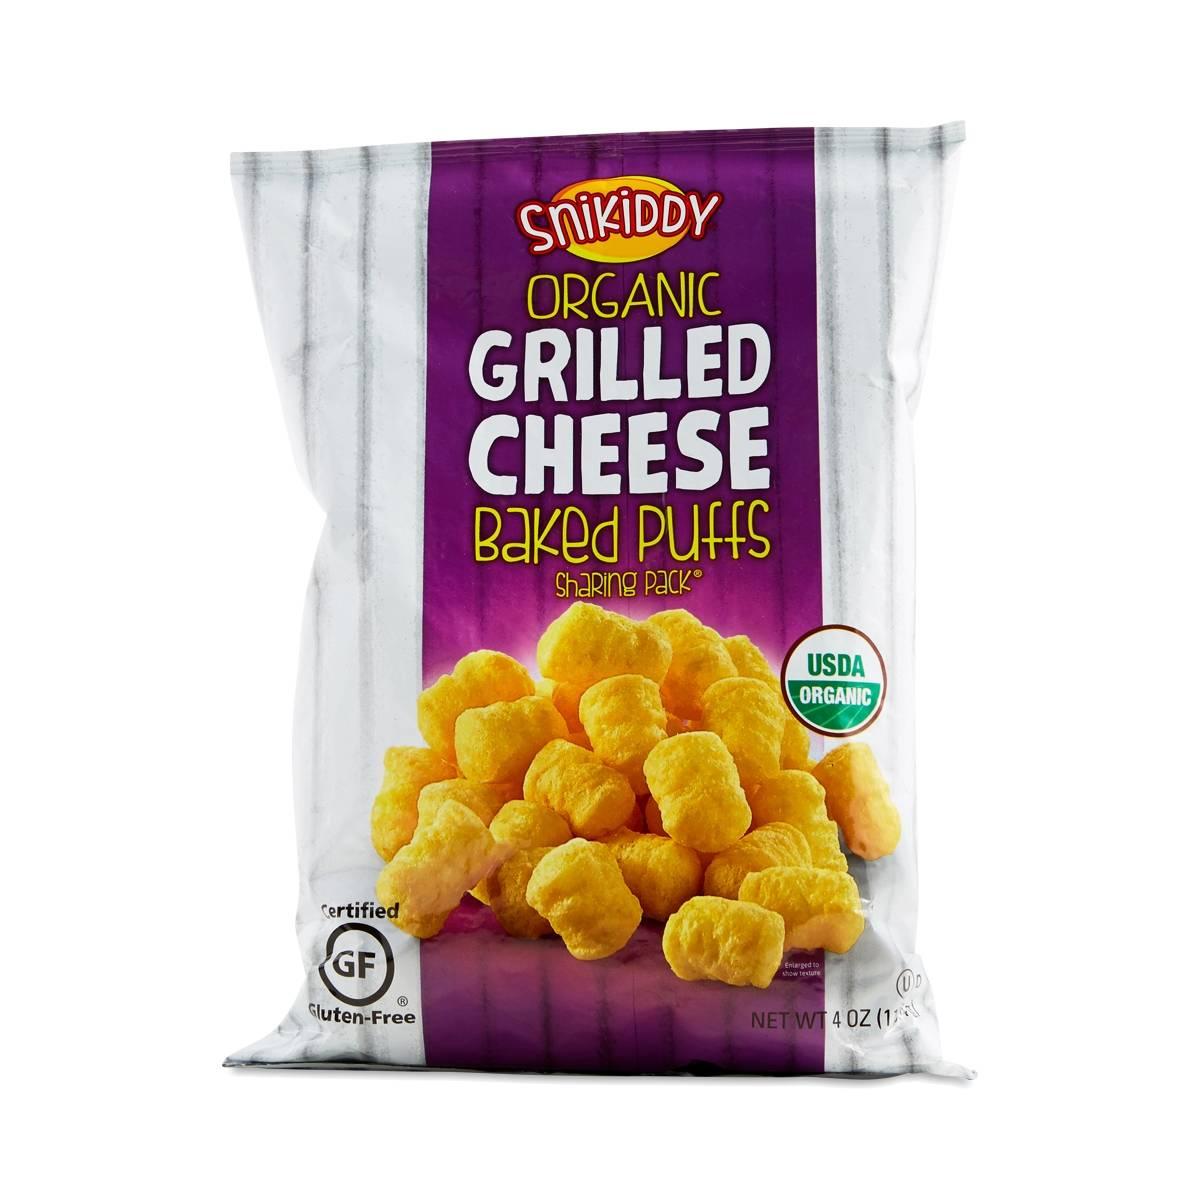 Amazon.com: Snikiddy Snacks Mac N' Cheese Puffs, 0.75 ...